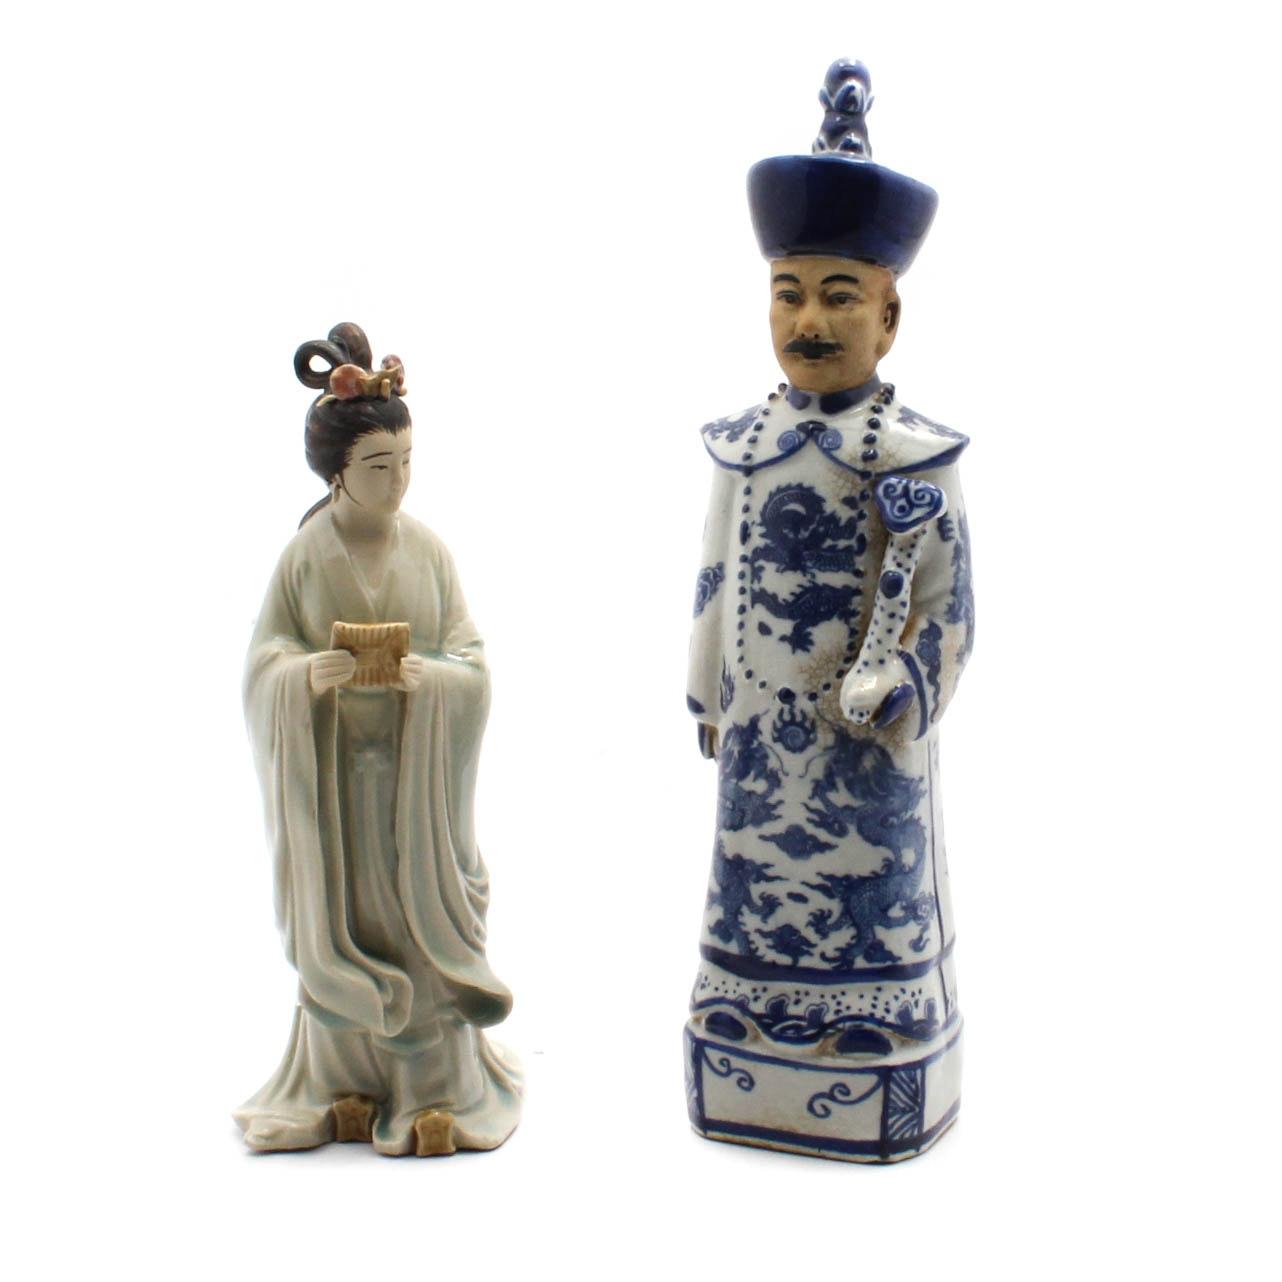 Vintage Chinese Ceramic Figurines